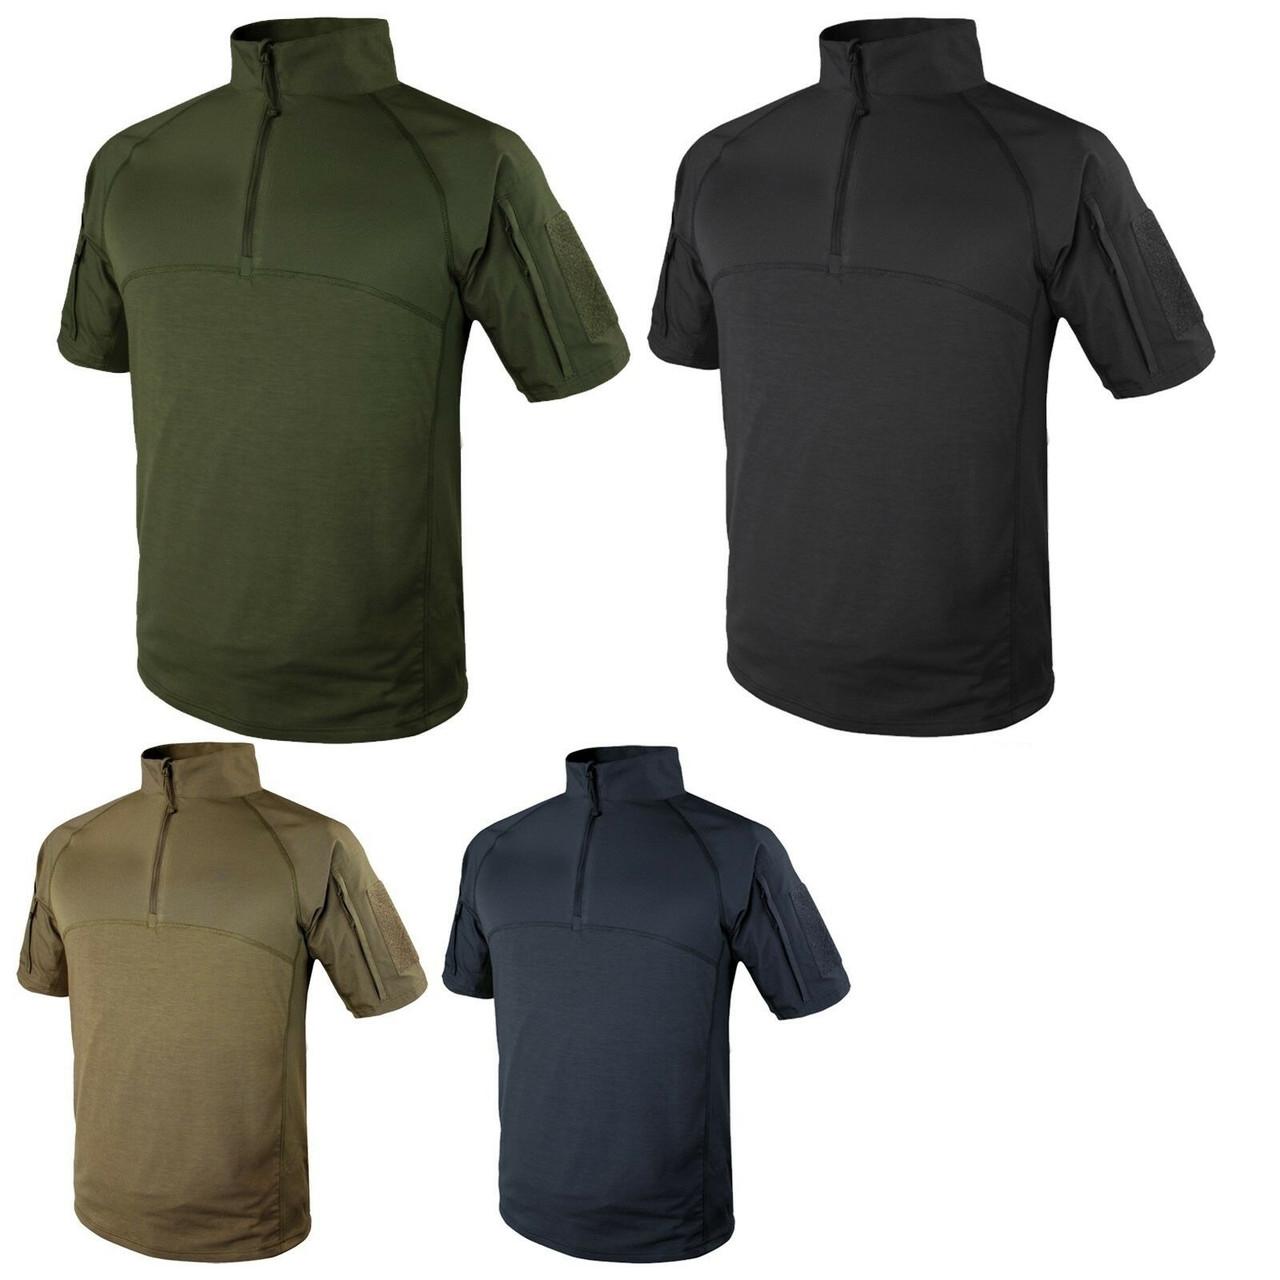 Medium, Navy Blue Condor Outdoor Tactical Short Sleeve Combat Shirt